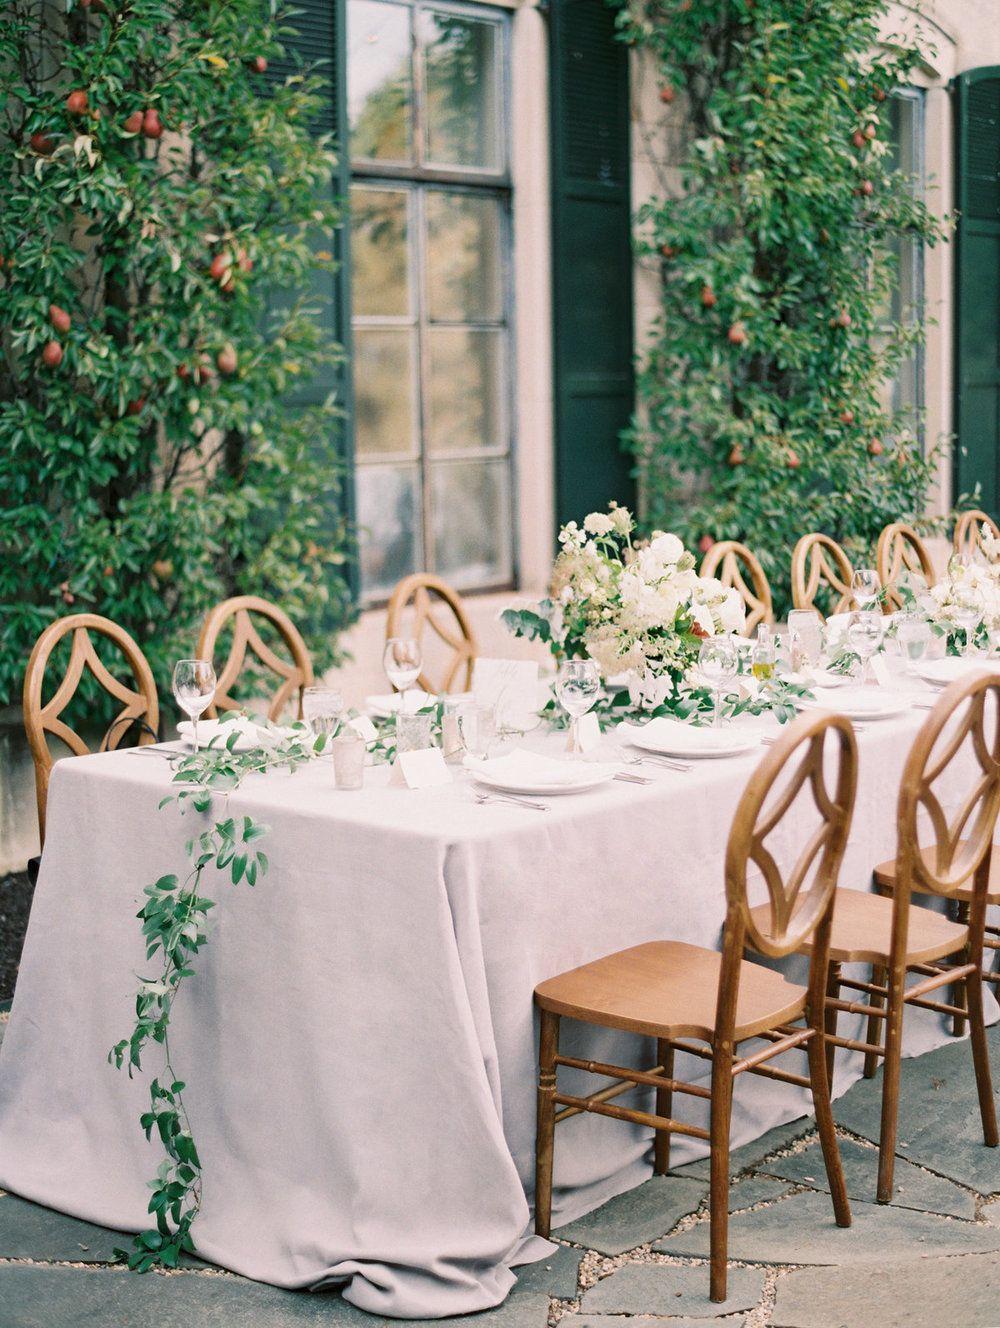 Luxury Bed Breakfast  Wedding Venue in Michigan  Greencrest Manor Greencrest Manor